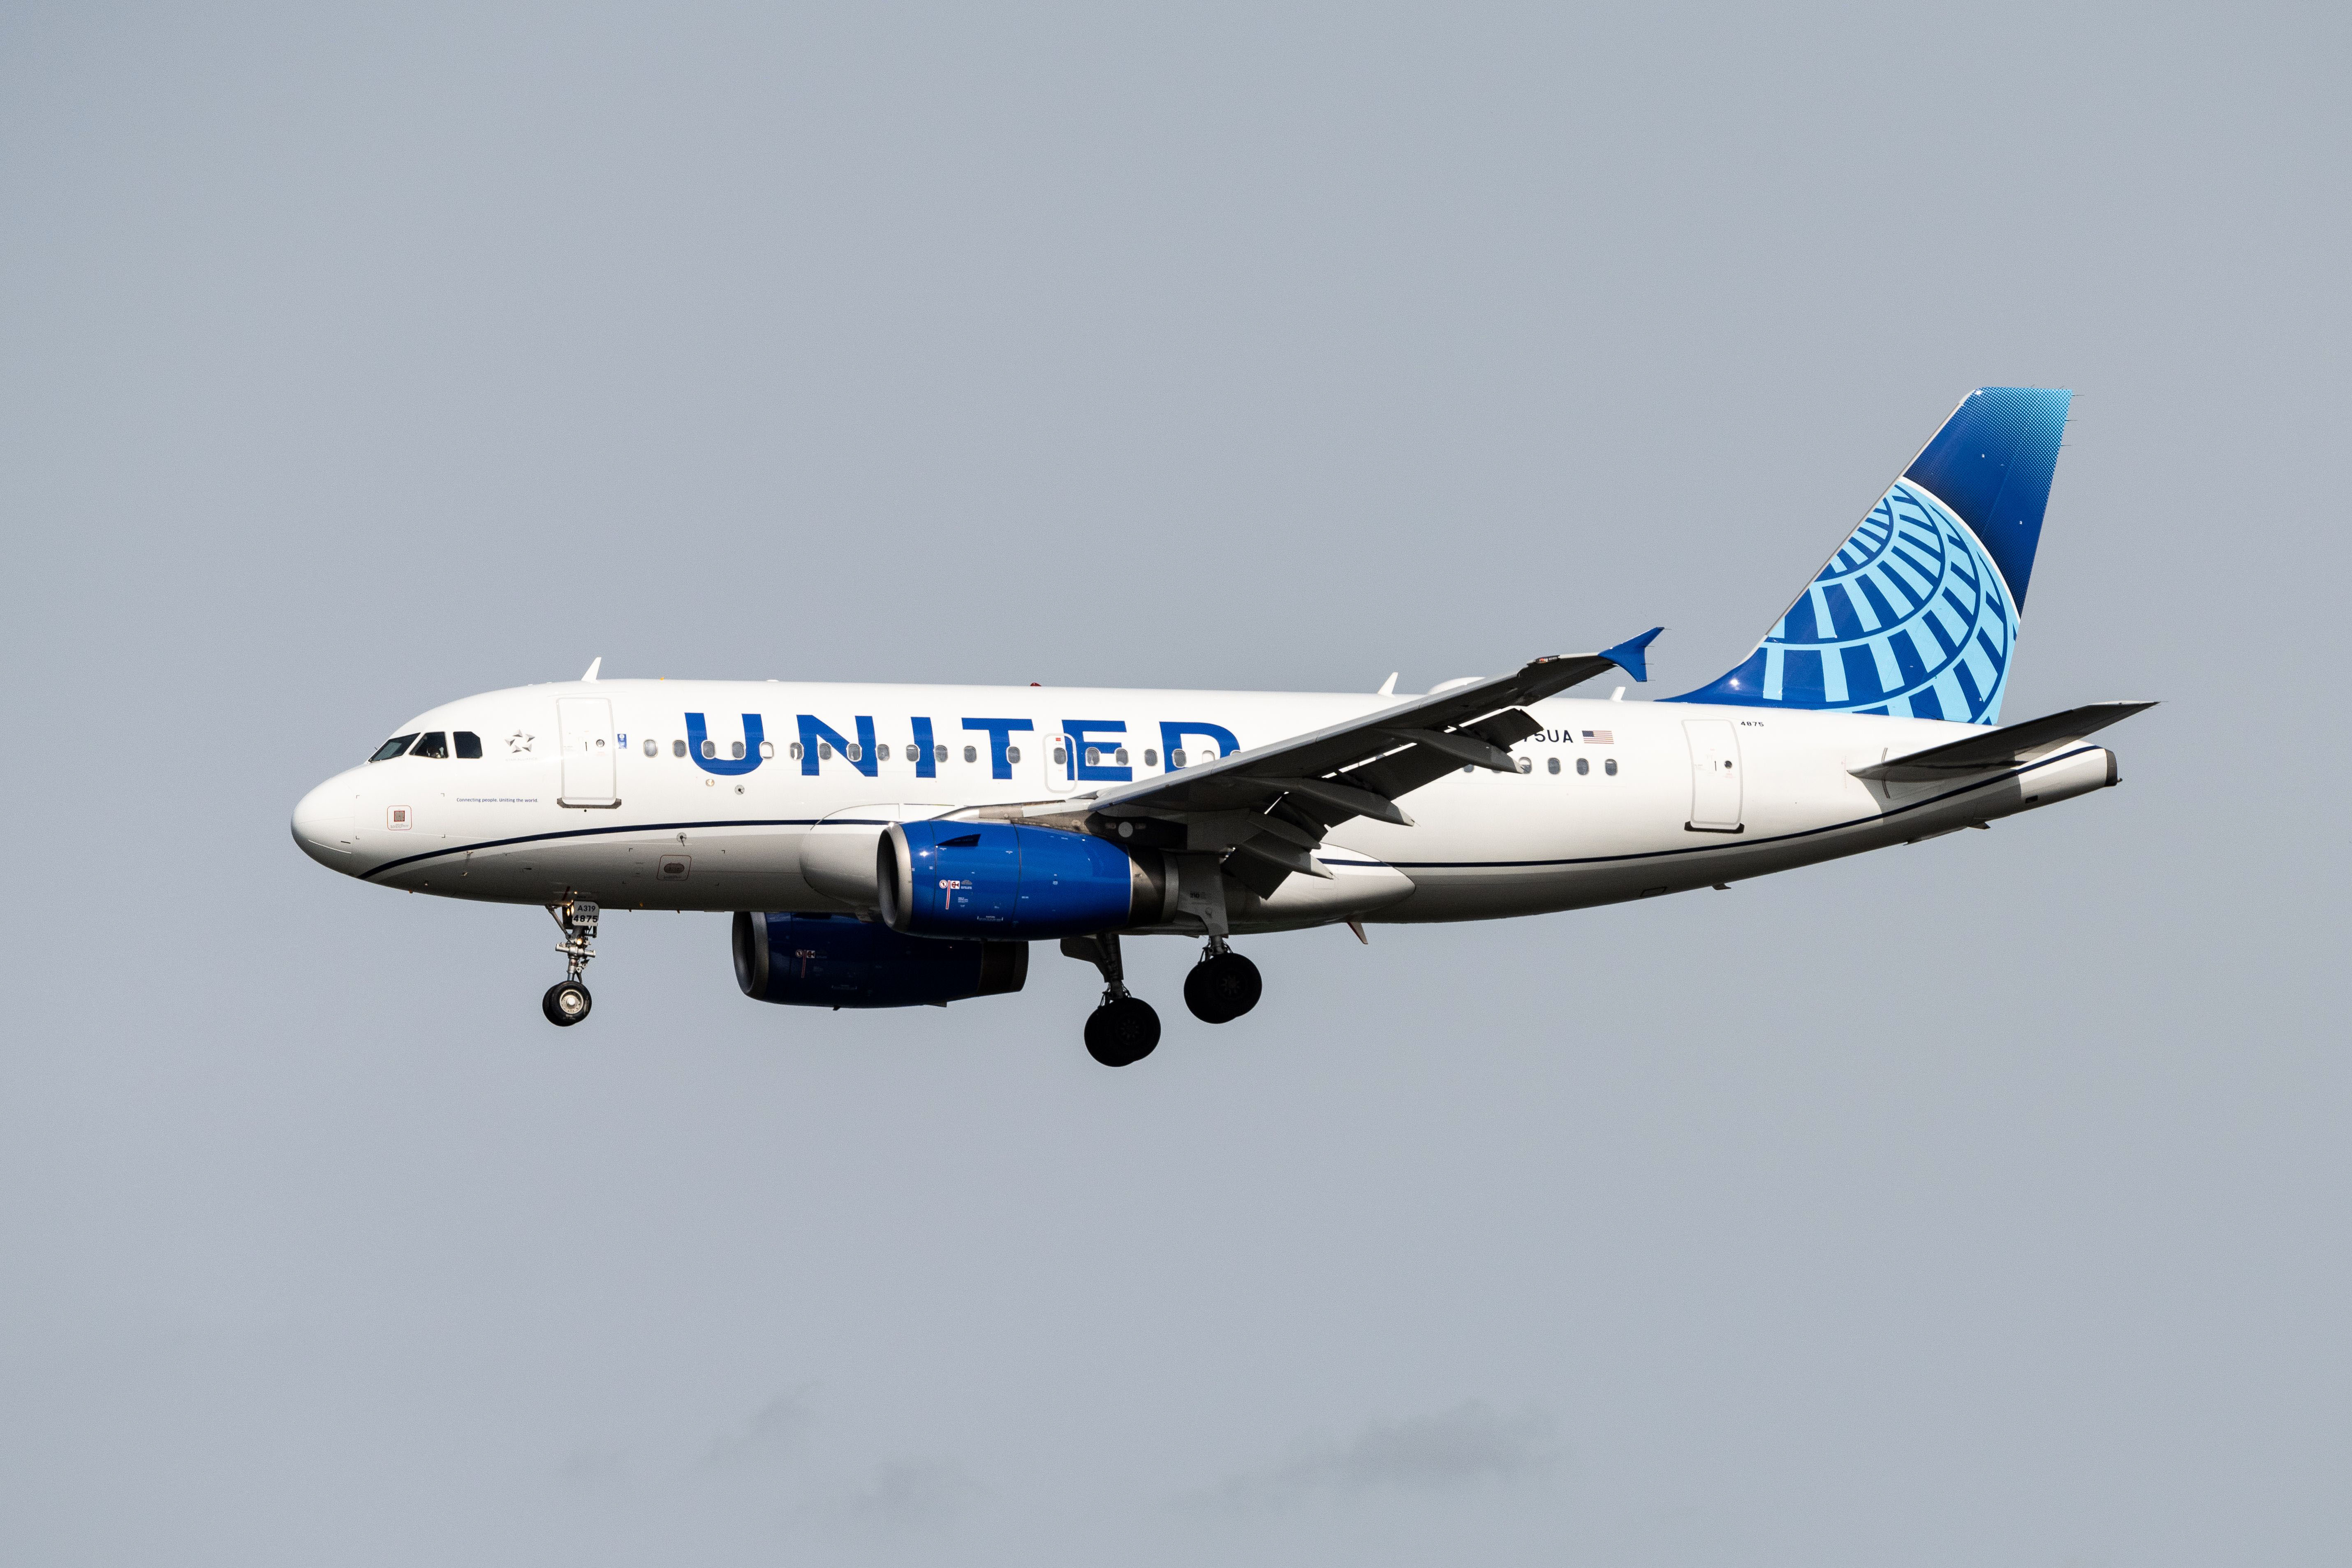 A United Airlines plane lands at Ronald Reagan Washington National Airport in Arlington, Virginia, on June 15.